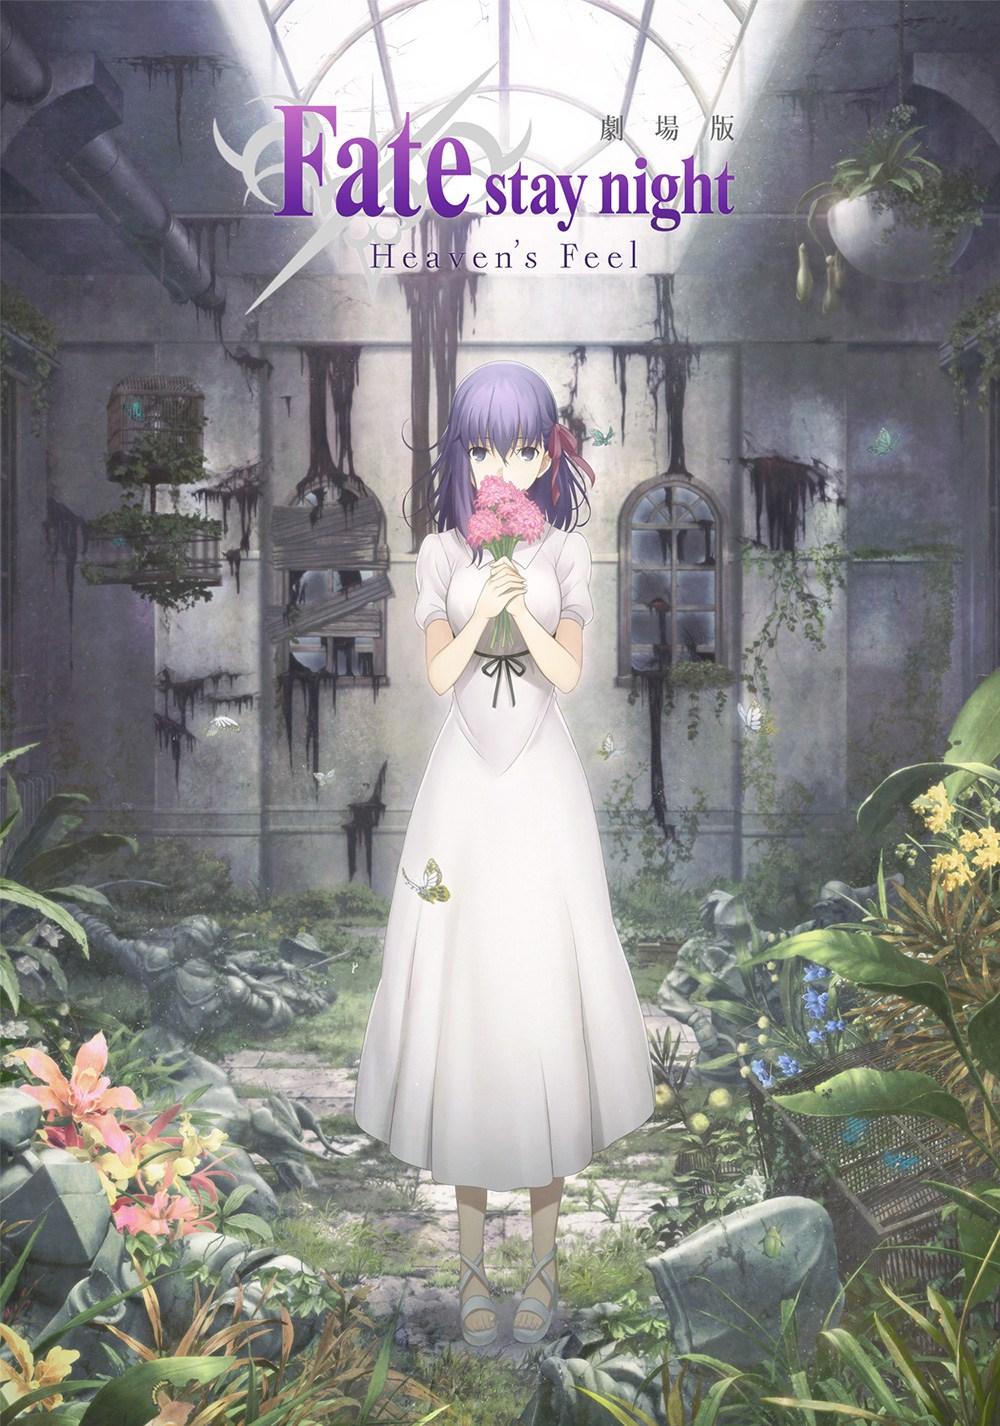 Fate-stay-night-–-Heavens-Feel-Anime-Visual